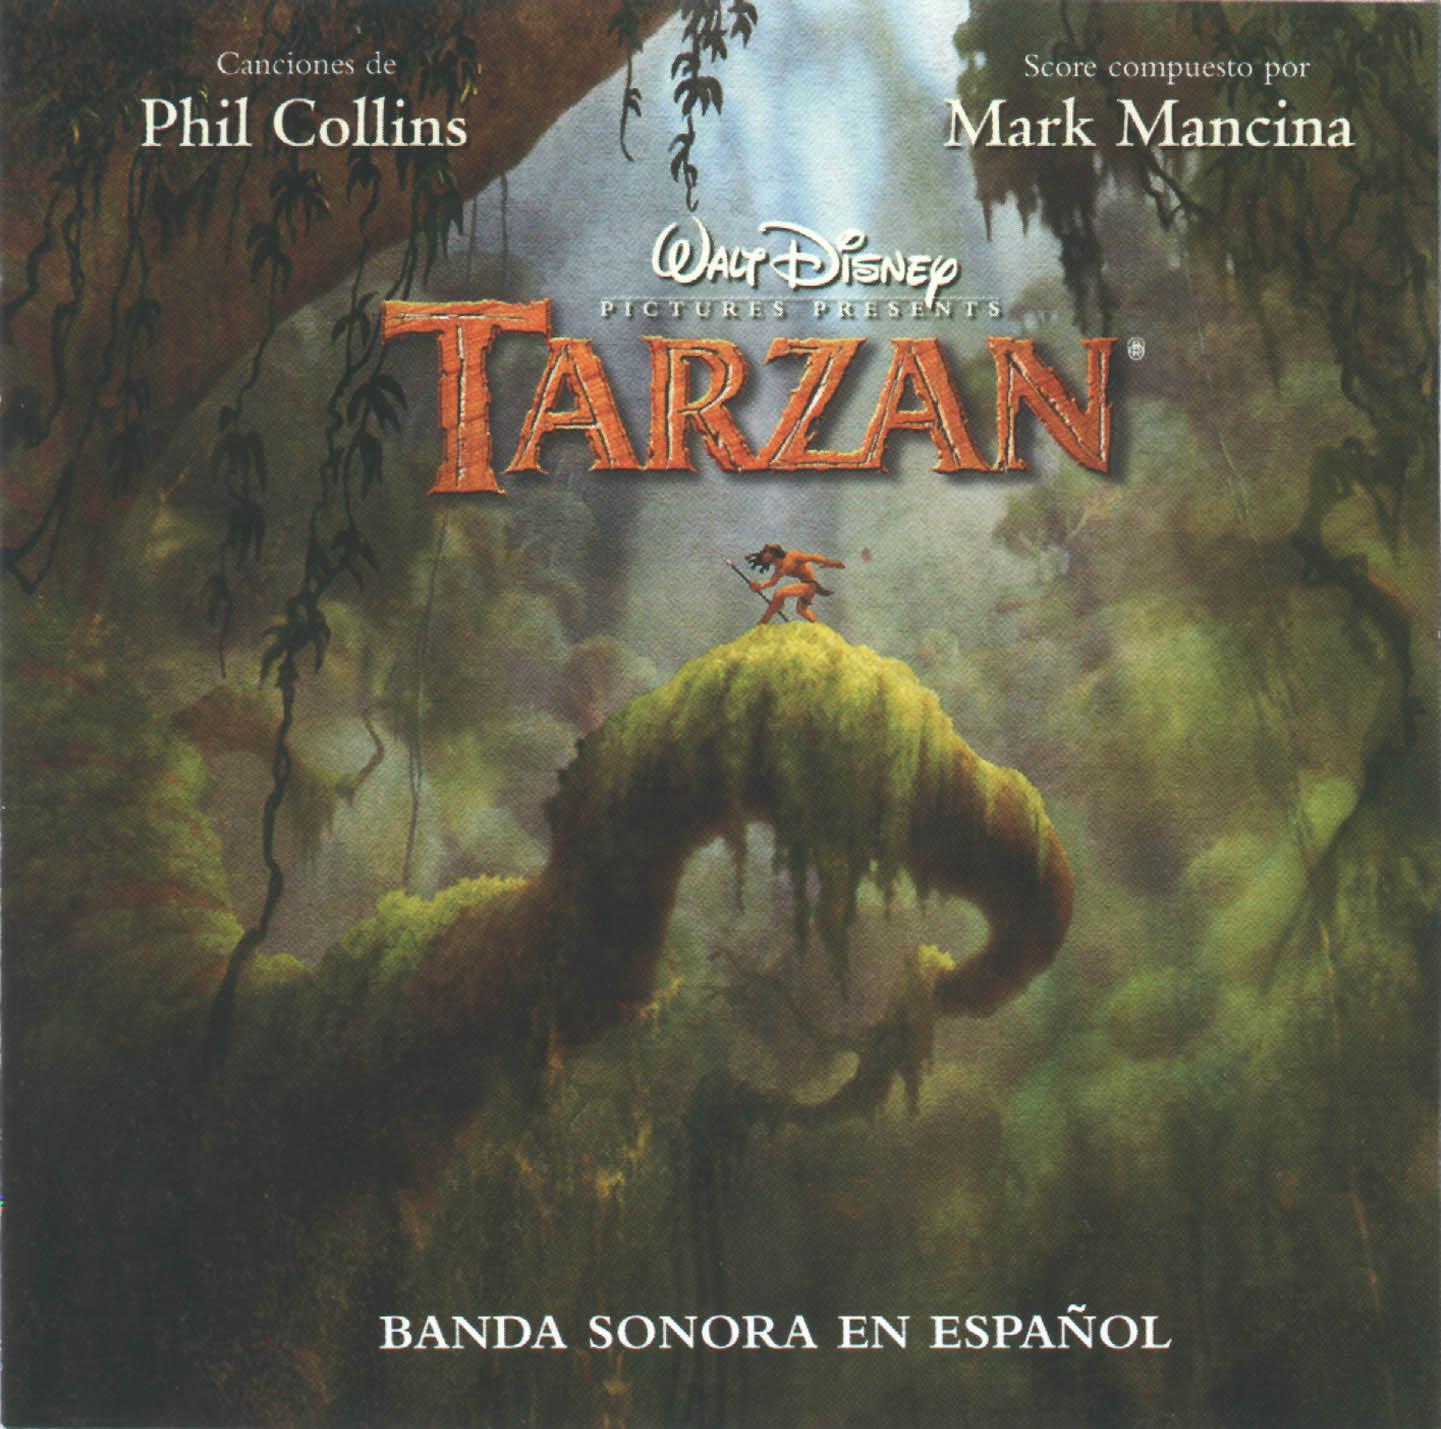 http://2.bp.blogspot.com/_EMOn74BB0S8/TAZSBppjNmI/AAAAAAAAArU/PXYjzBw07jA/s1600/BSO_Tarzan_(Castellano)--Frontal.jpg